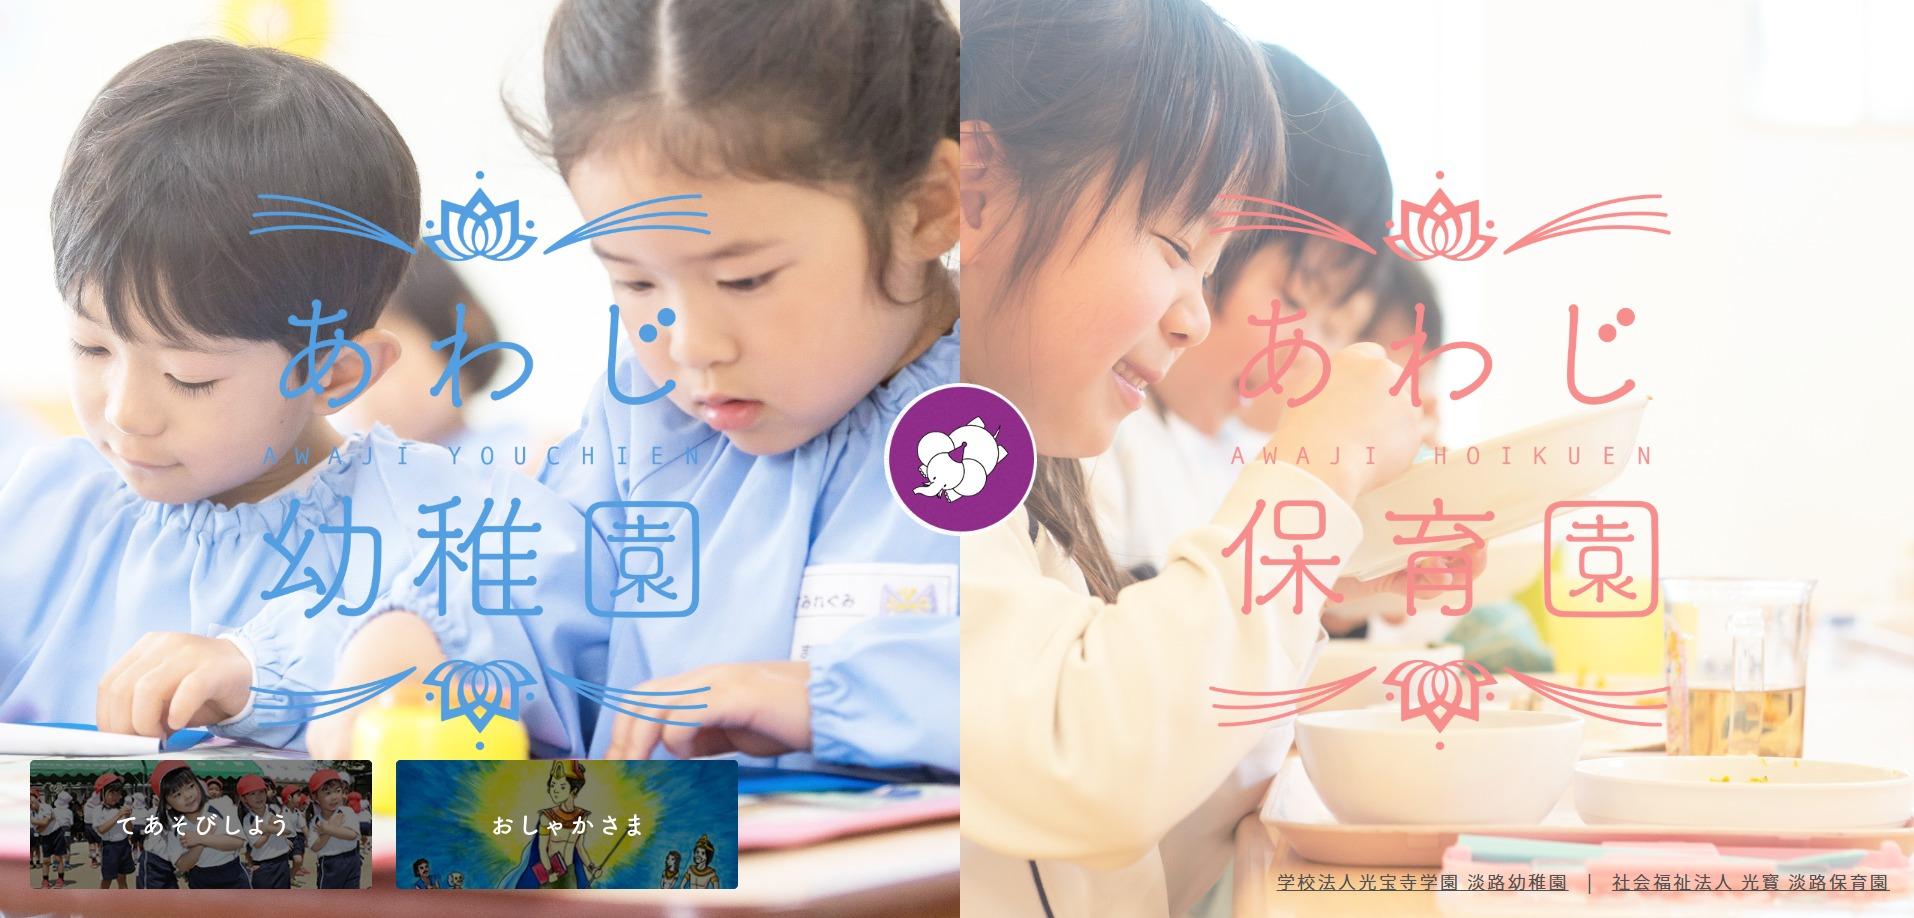 淡路幼稚園 淡路保育園PC版イメージ